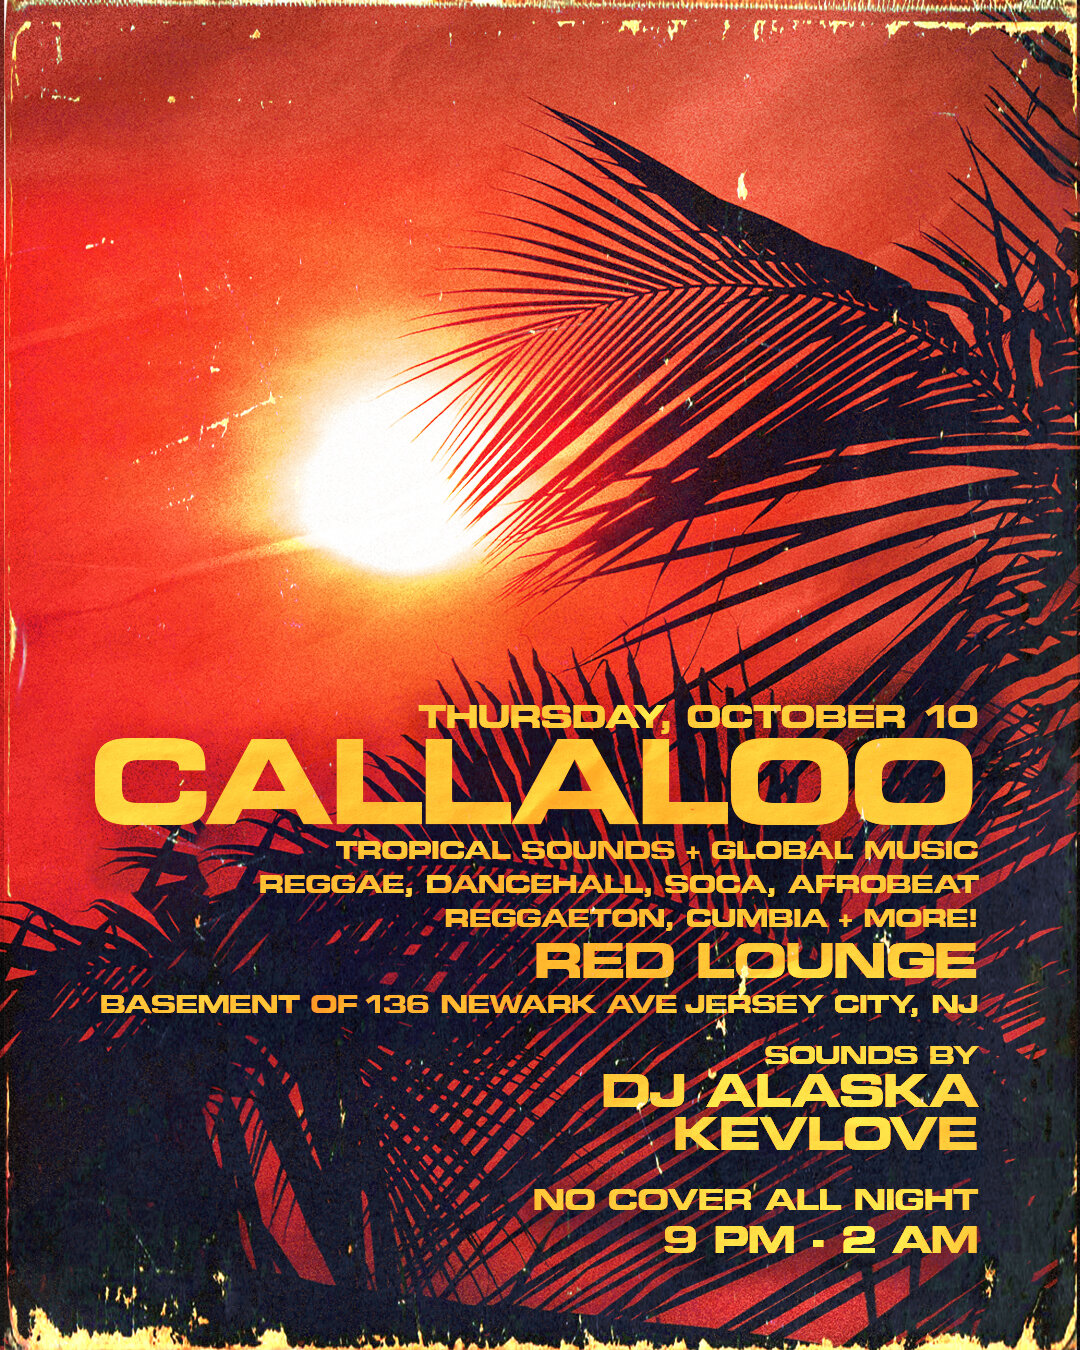 Callaloo-OCT-10.jpg